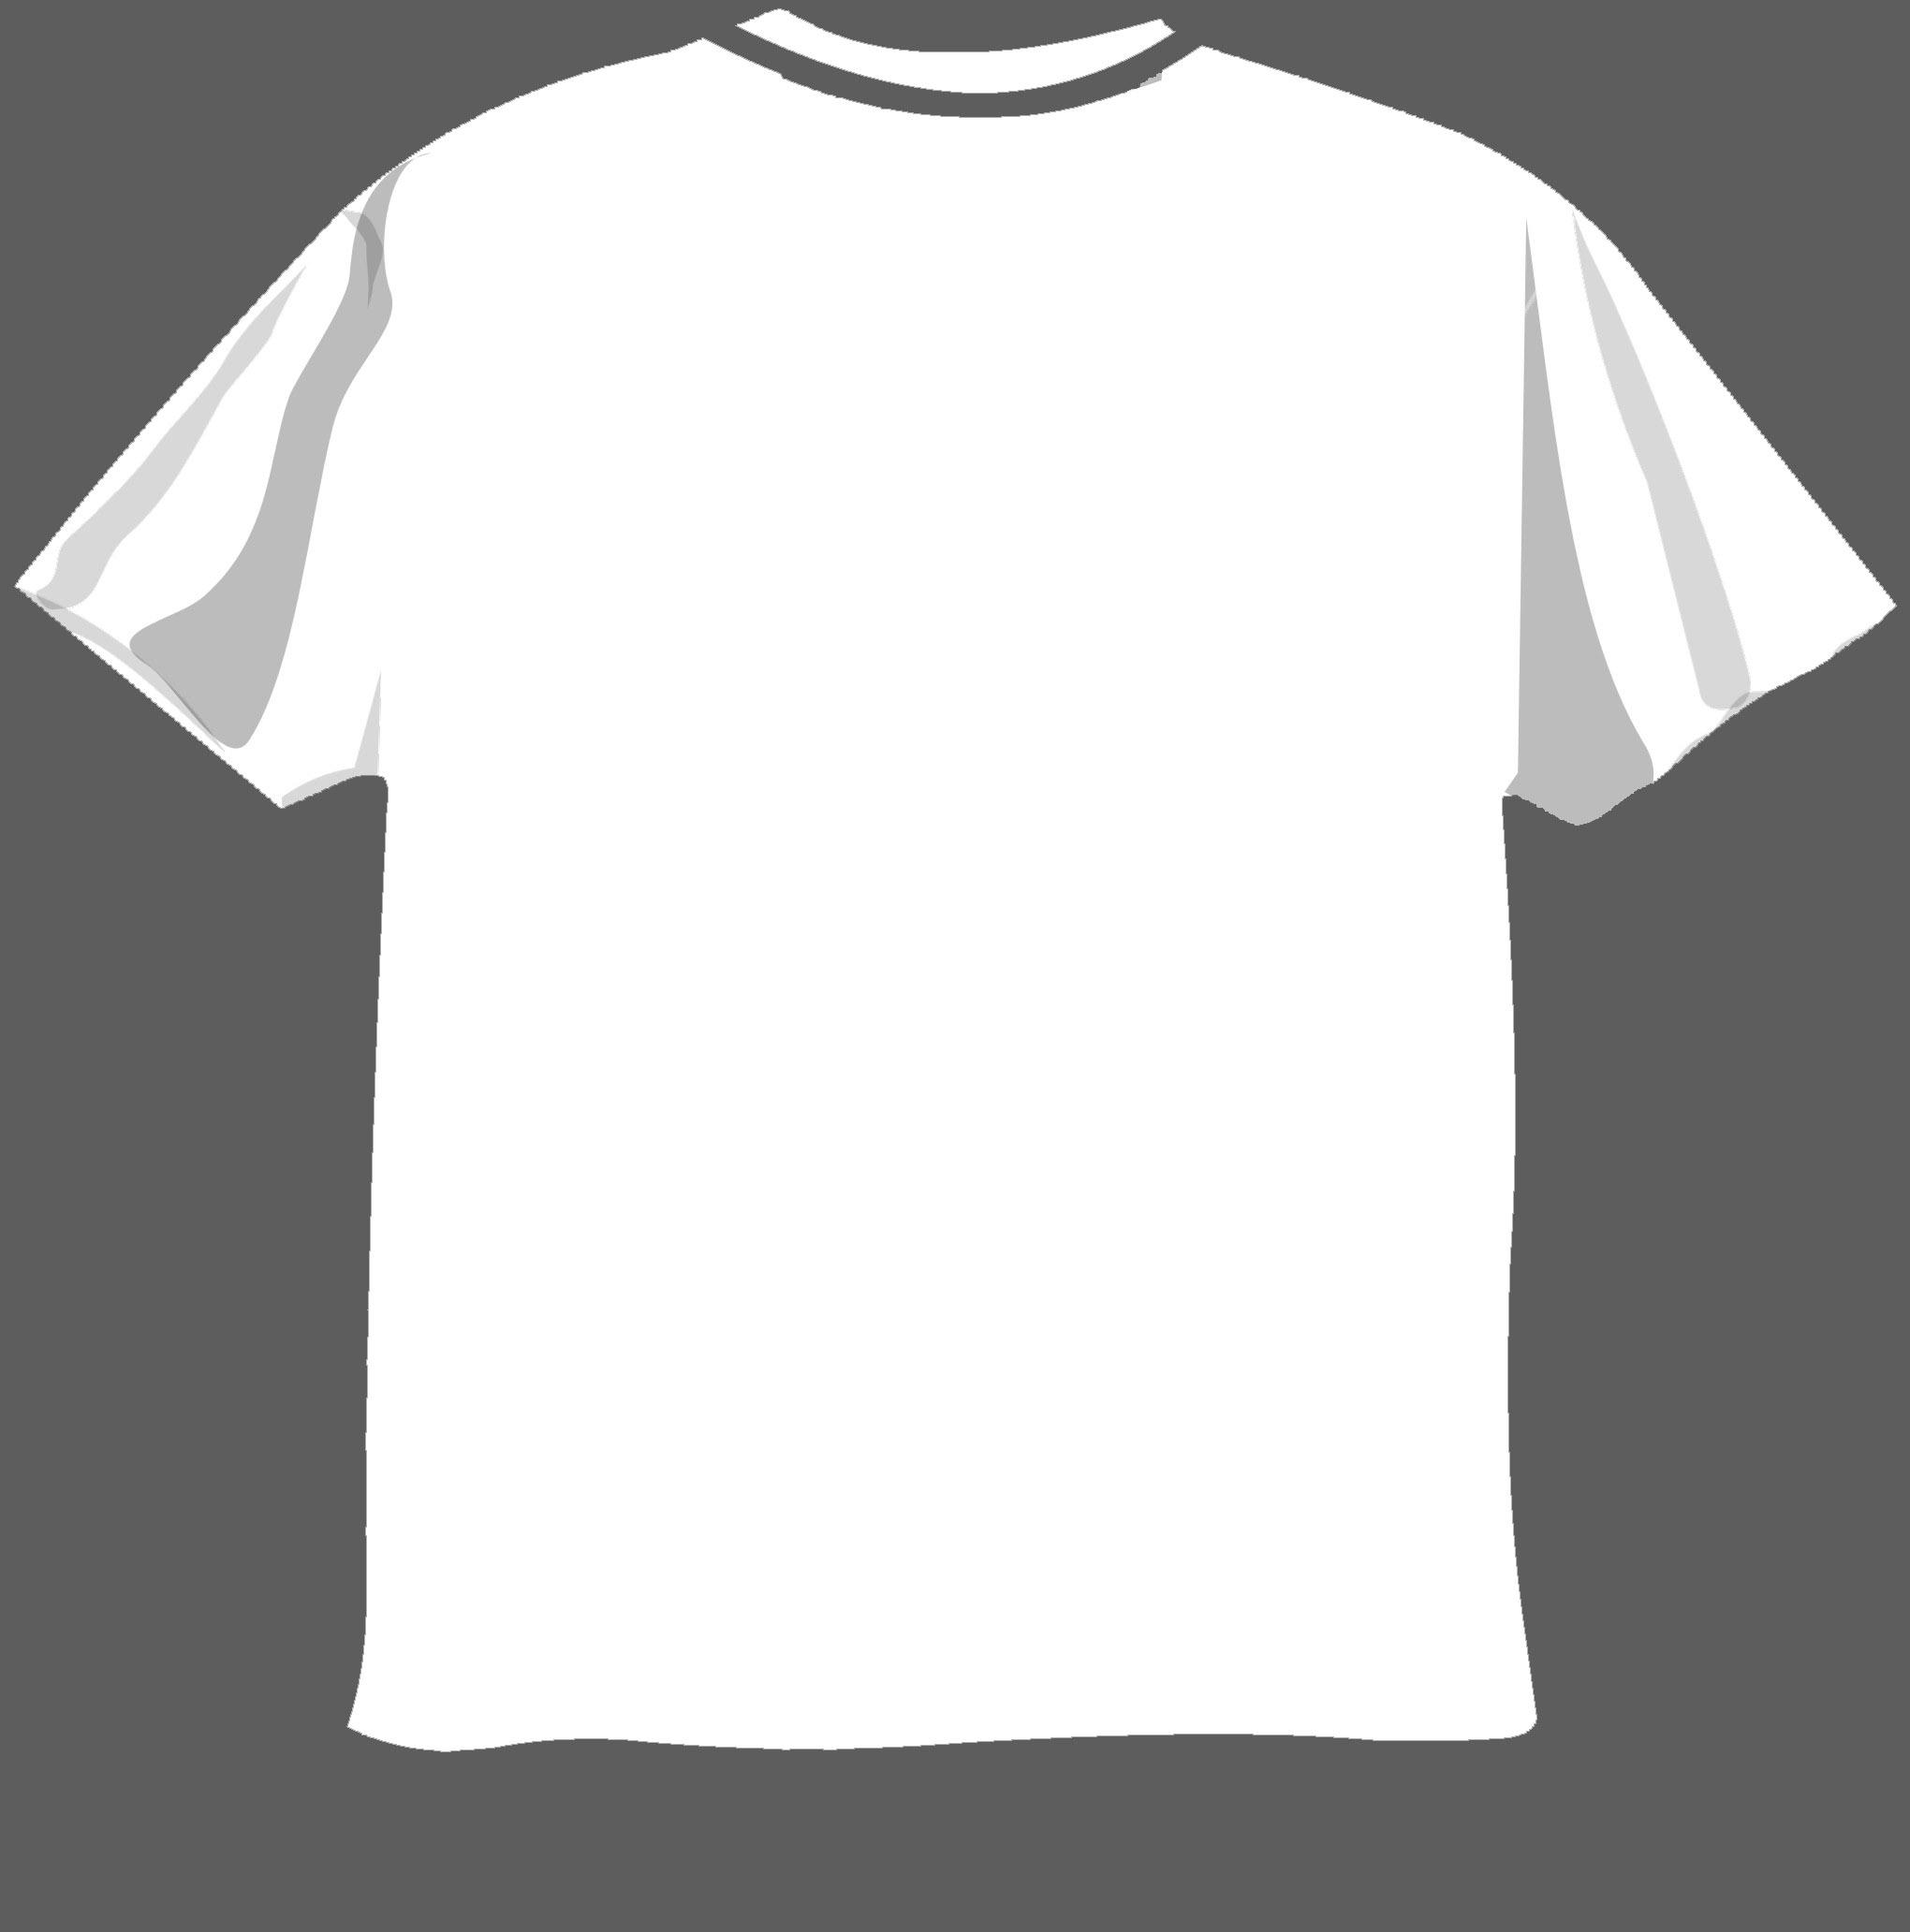 Black T Shirt Design Template Photoshop